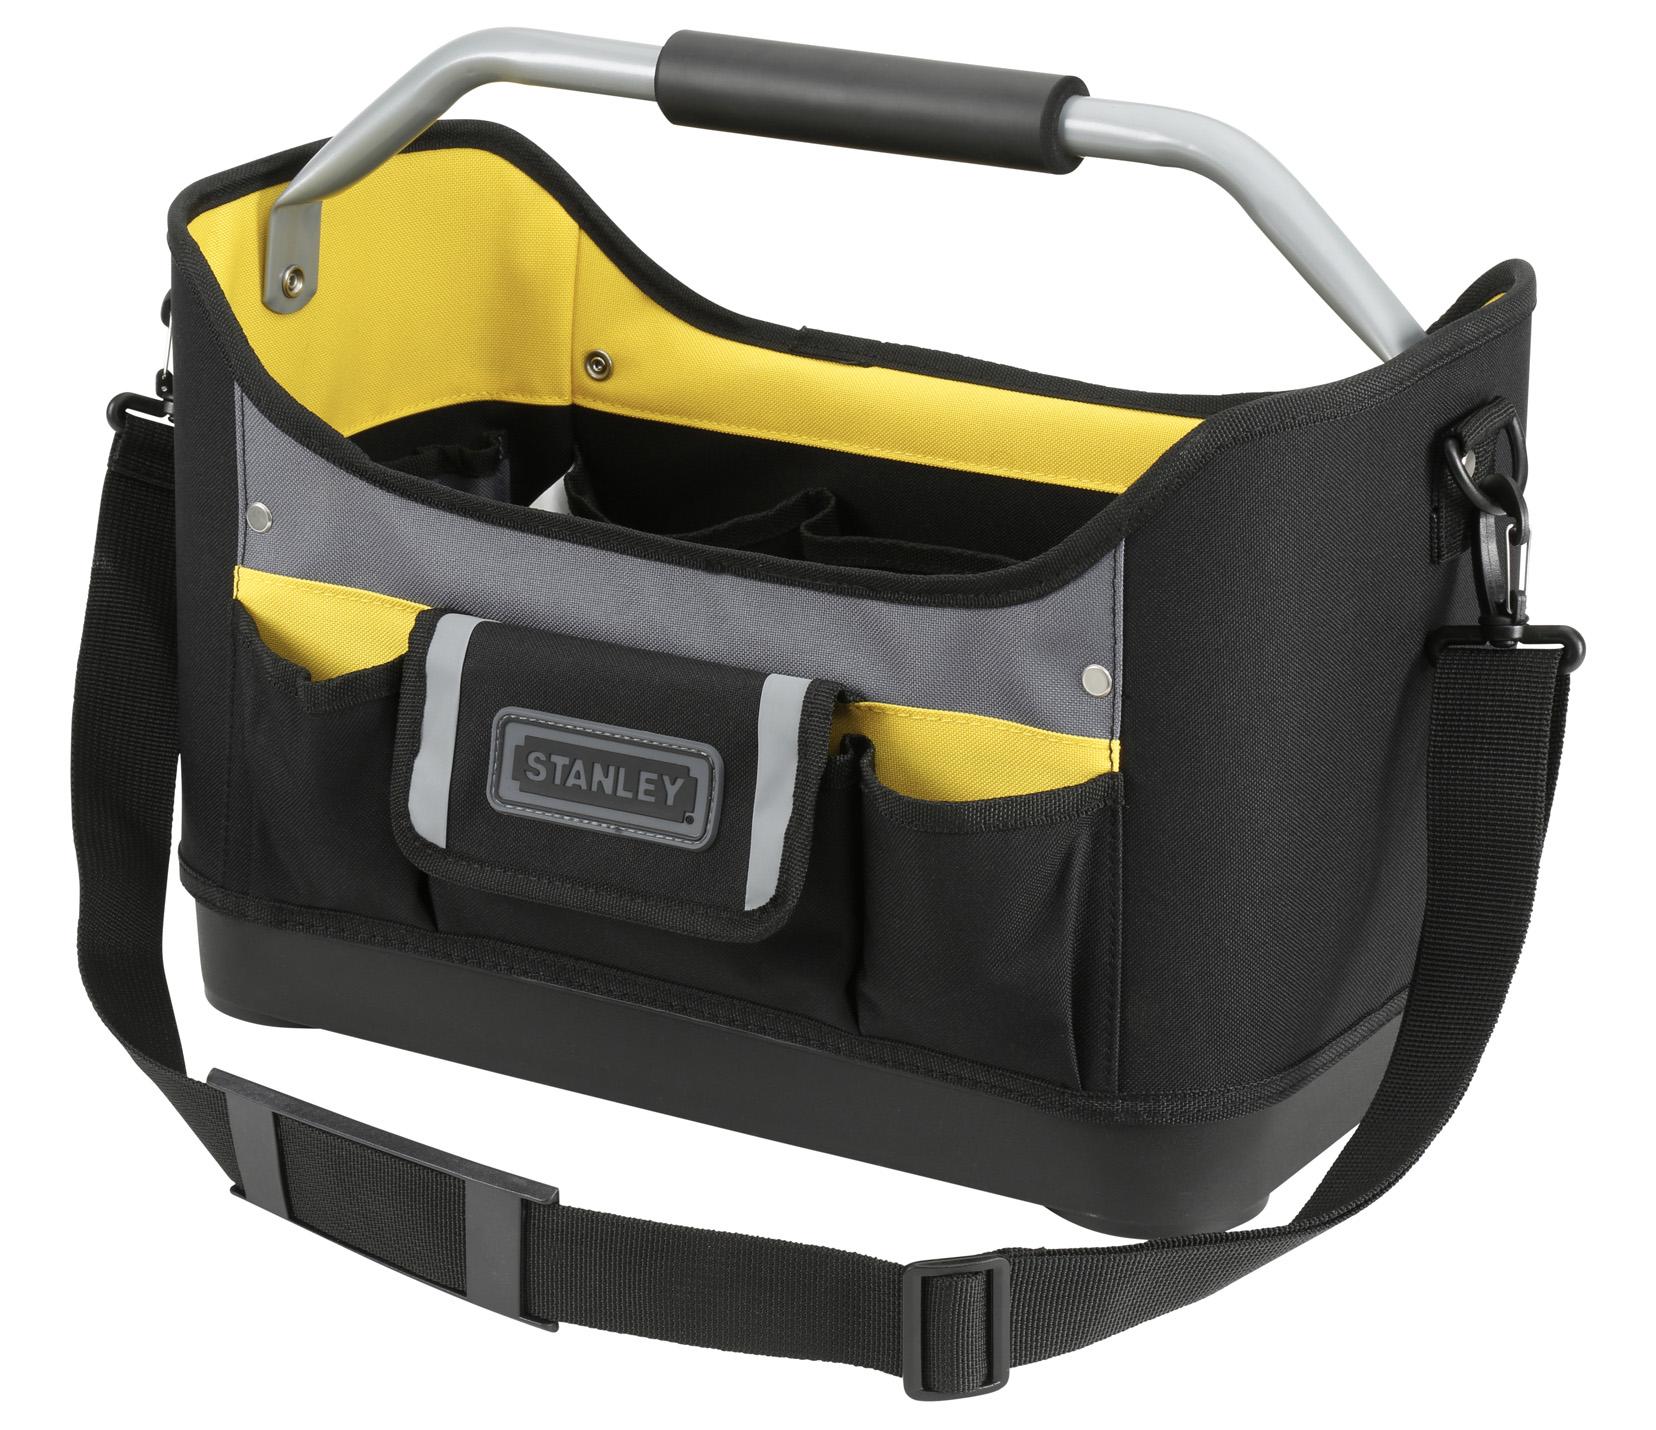 sac porte outils 40cm stanley caisse outils. Black Bedroom Furniture Sets. Home Design Ideas